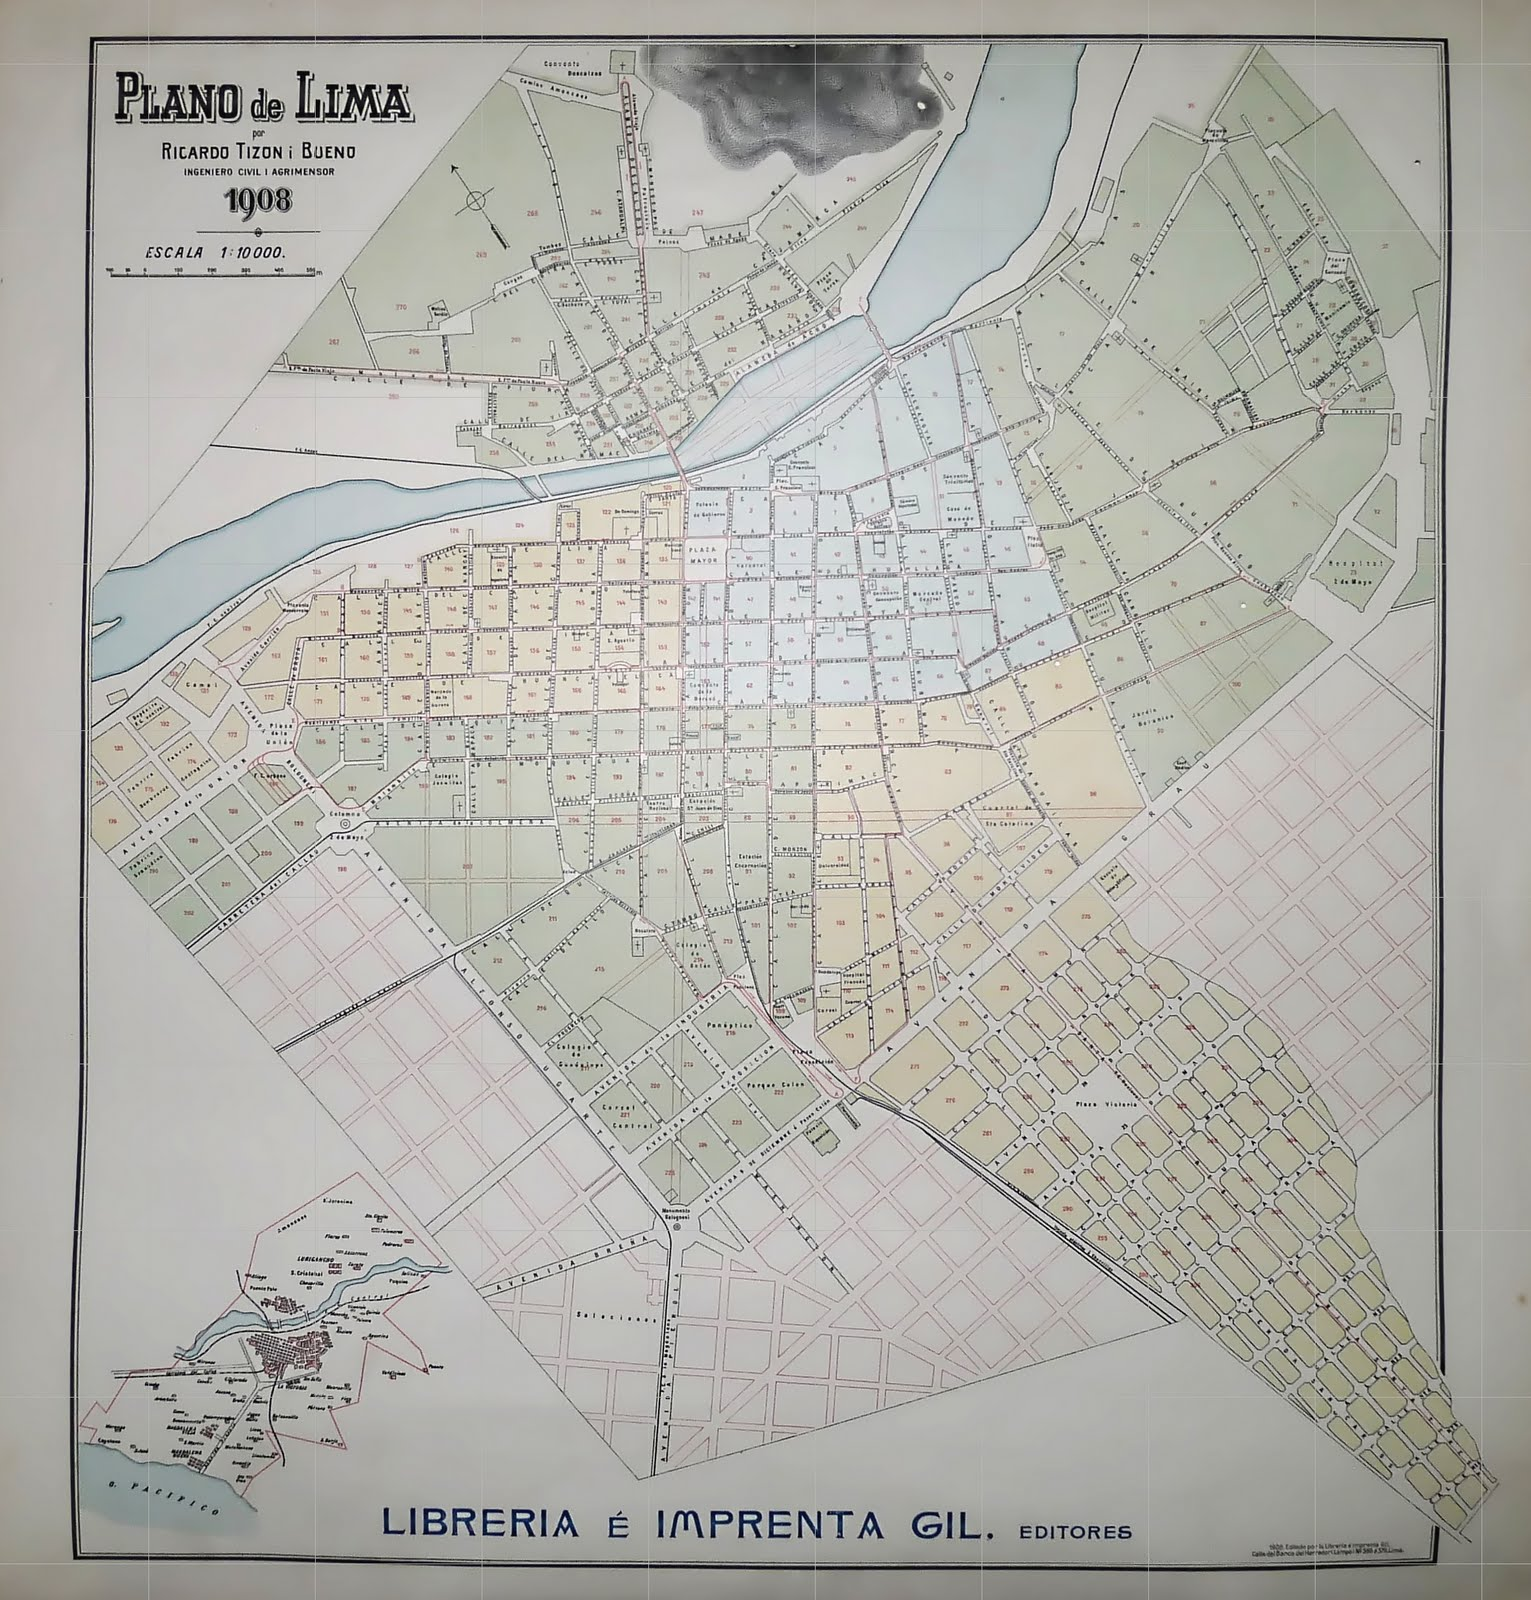 Planos de Lima Antigua Plano de Lima por Ricardo Tizon i Bueno 1908